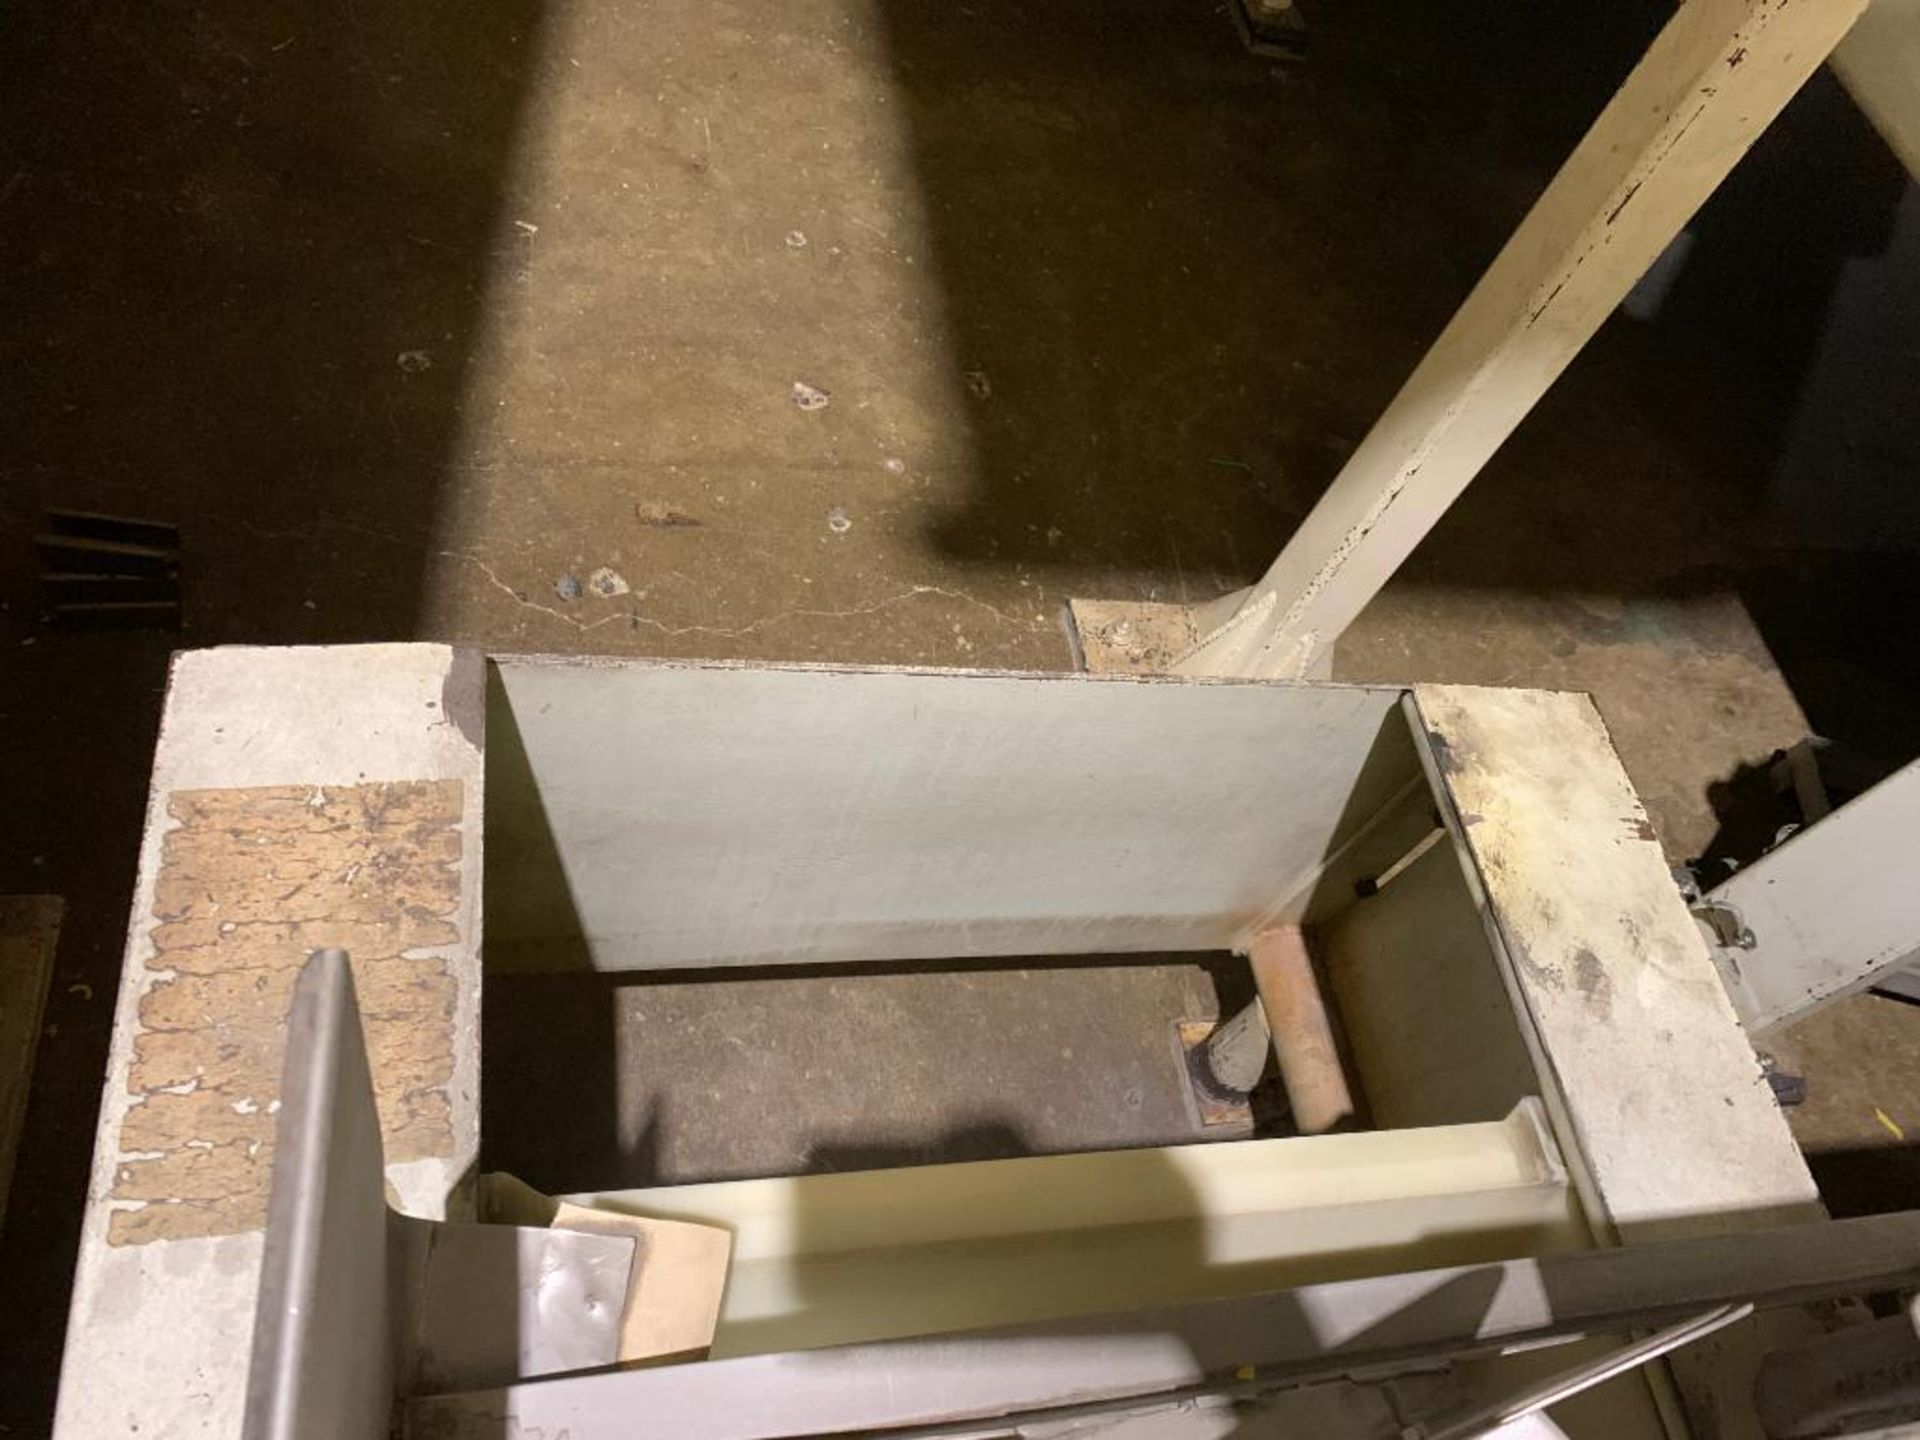 1990 Aseeco horizontal bucket elevator, model ALH-0-24 - Image 13 of 16